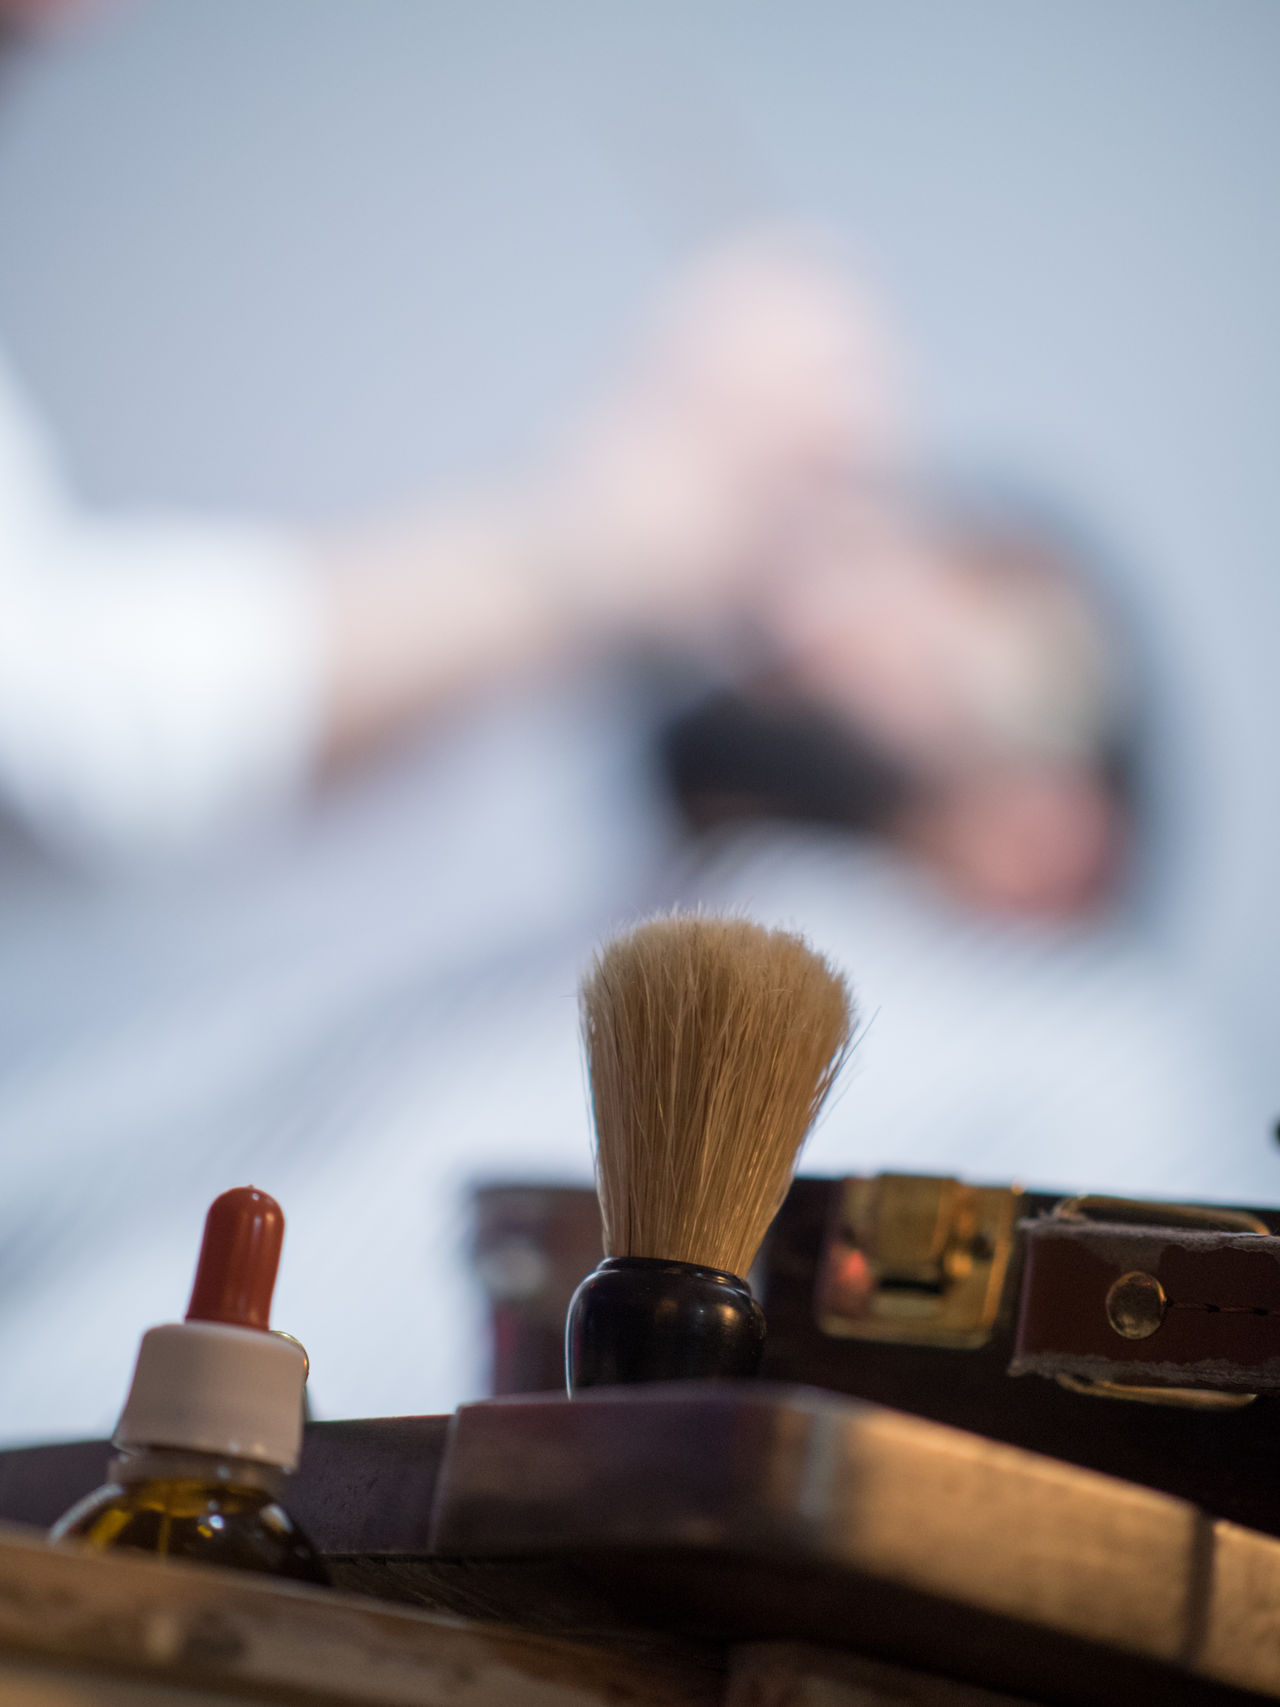 Barber shop Barber Shop Beauty Close-up Day Indoors  Make-up Brush Man No People Work